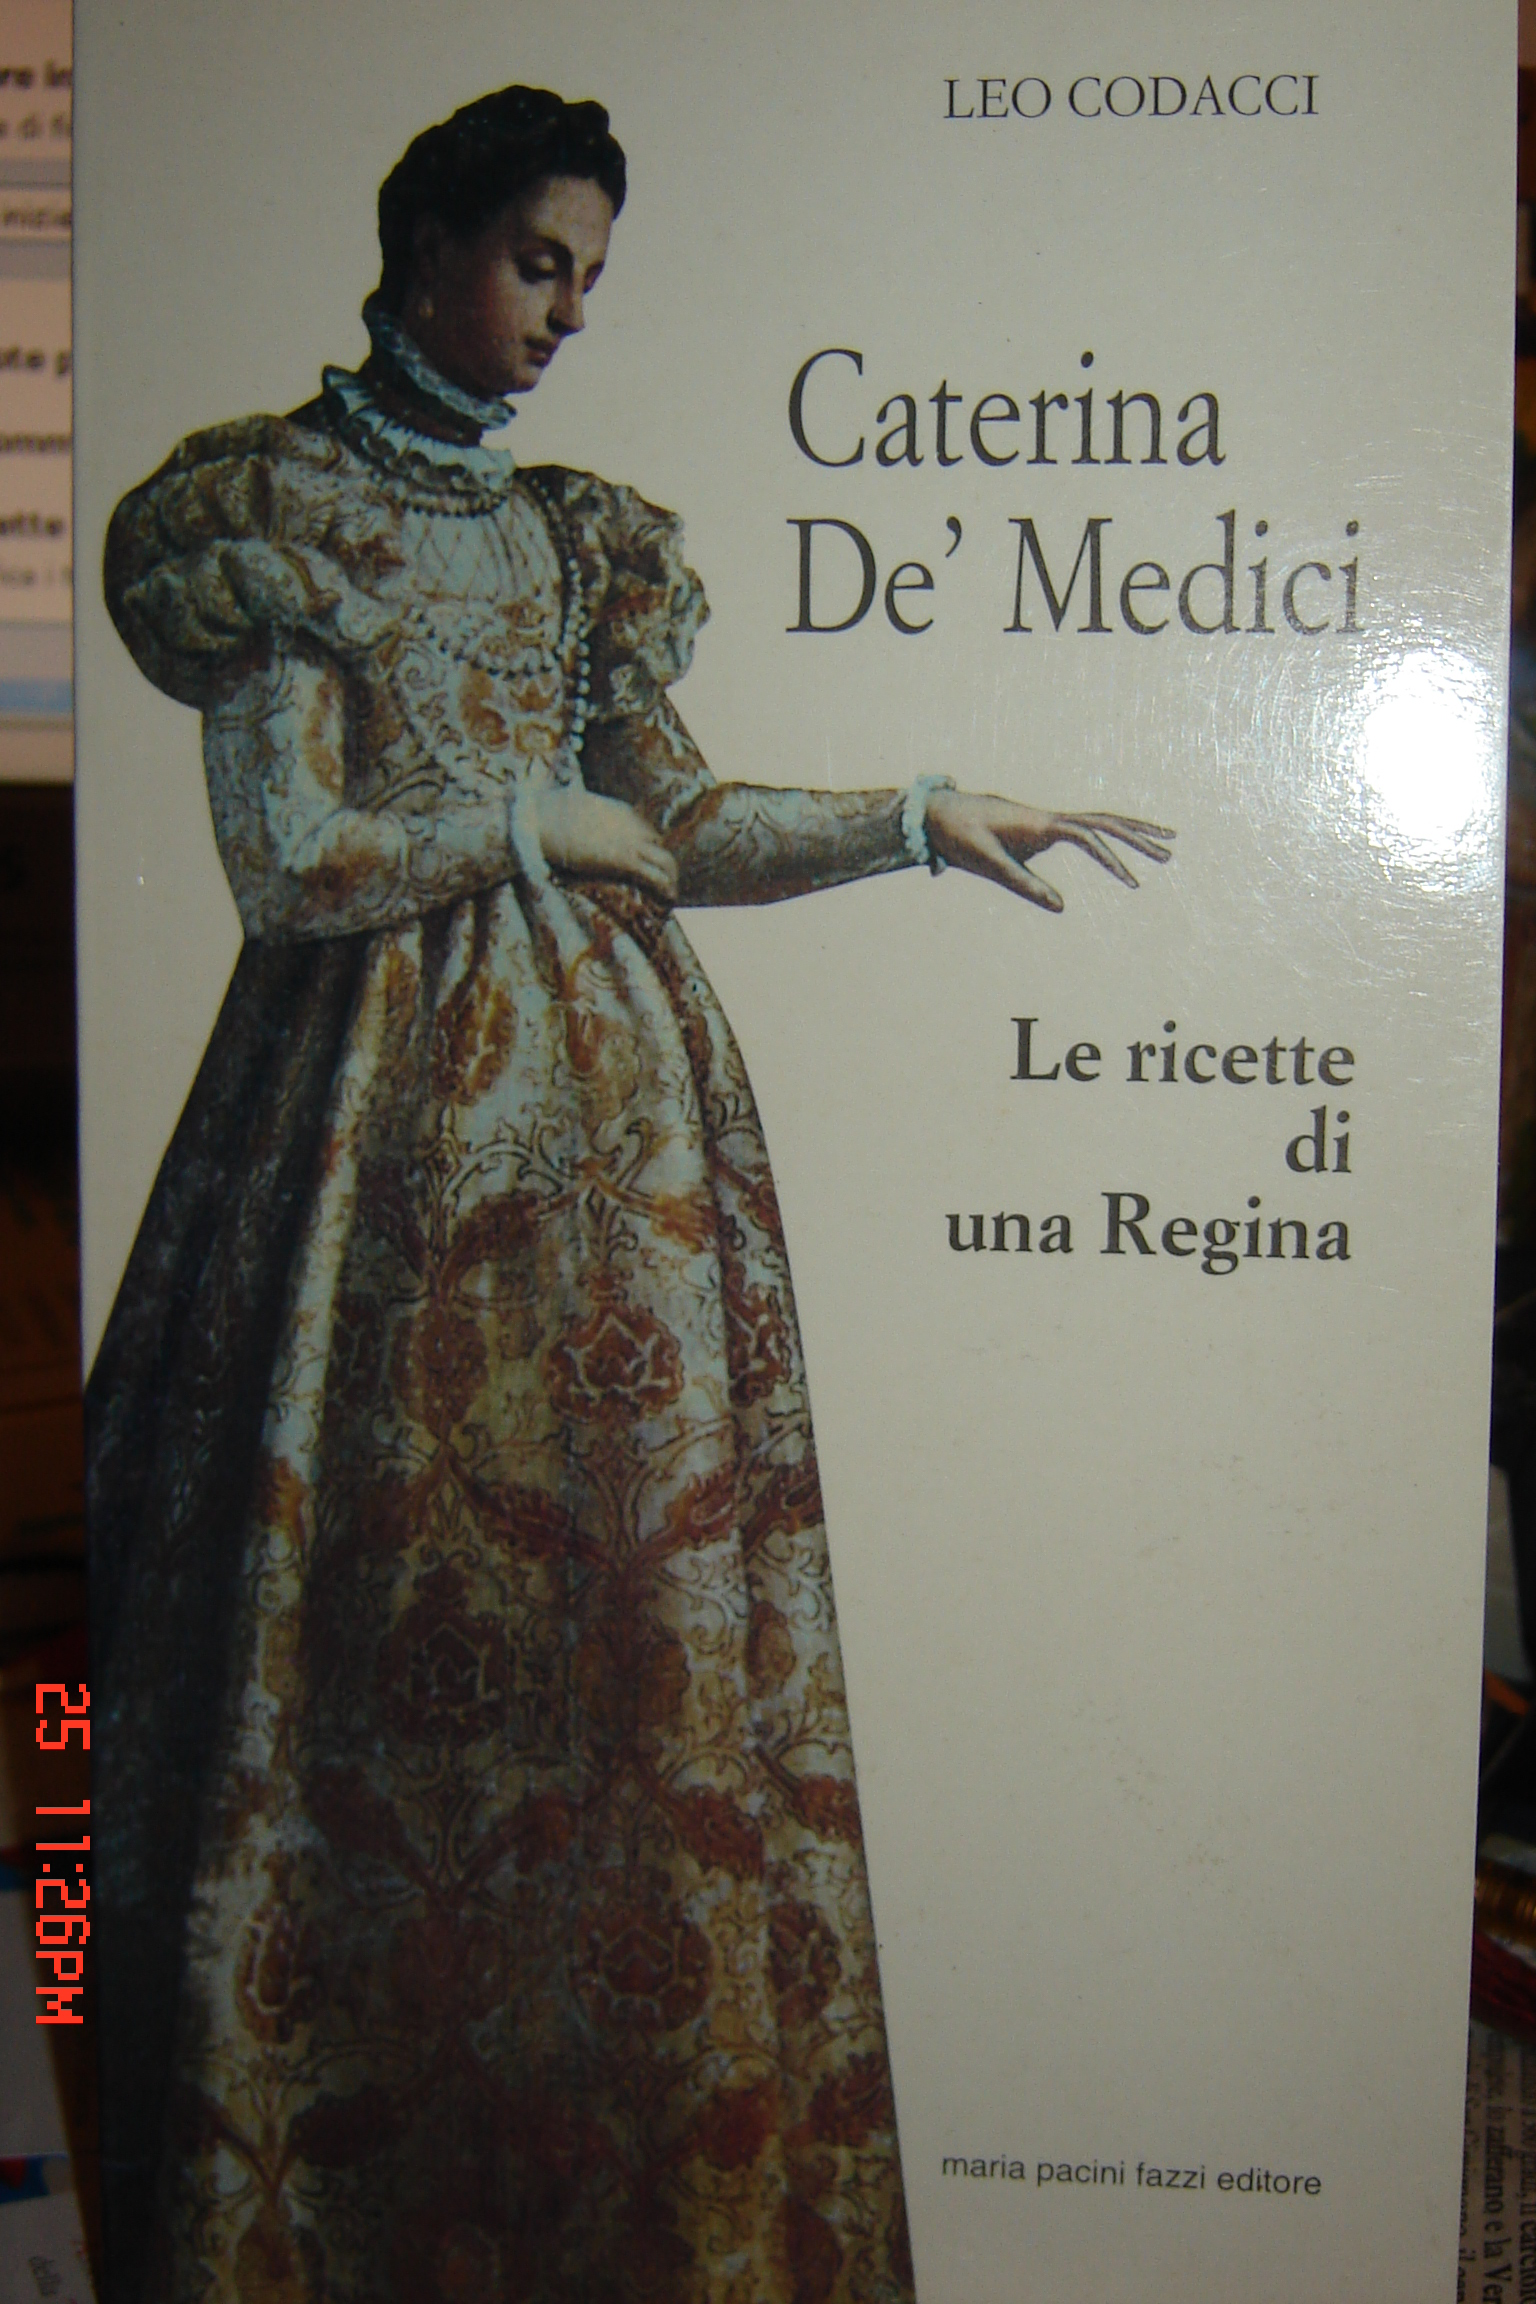 Caterina de' Medici: le ricette di una regina